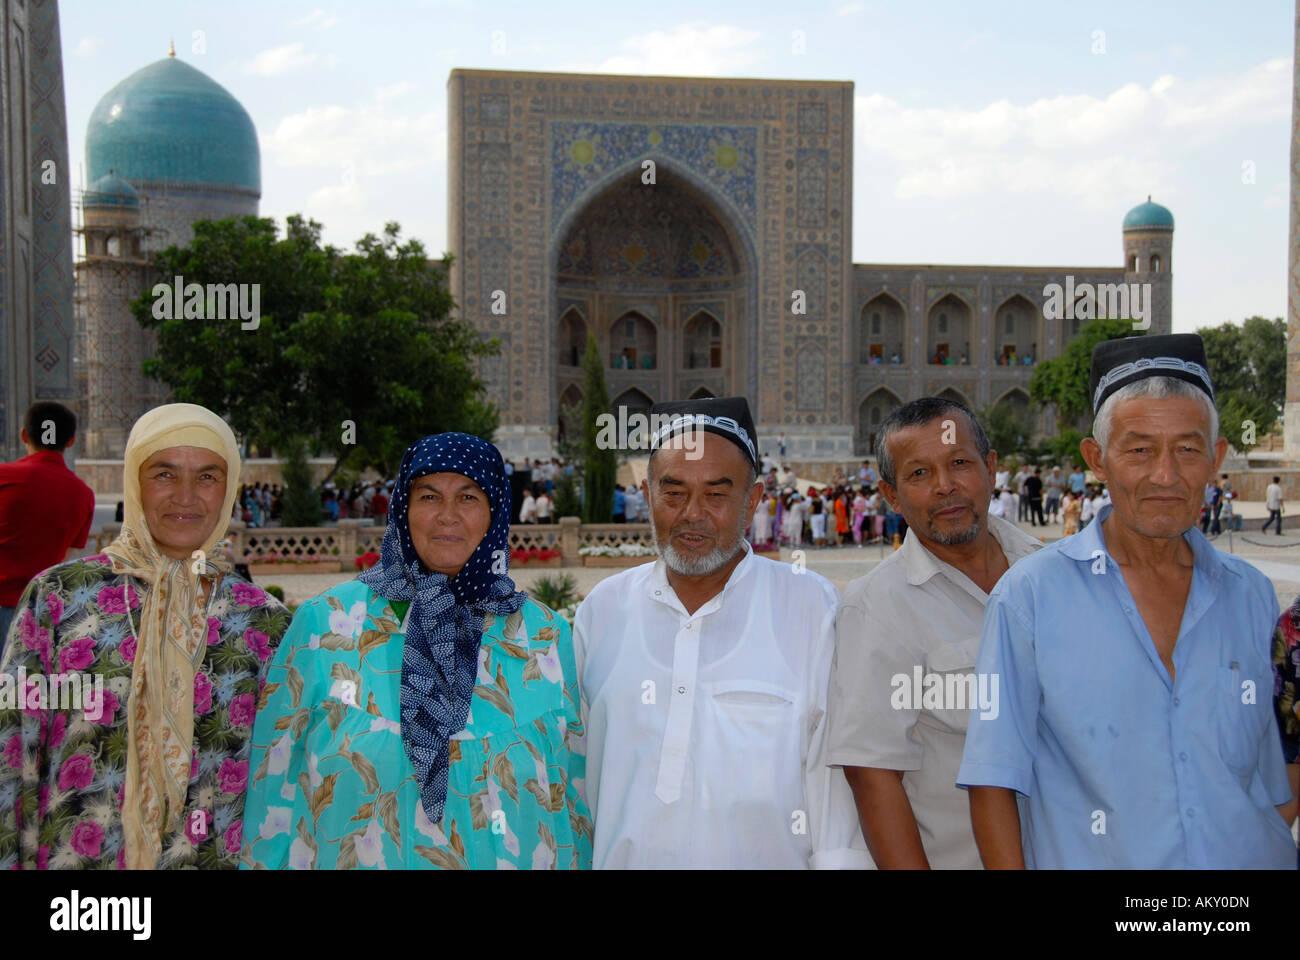 Uzbek people dressed in traditional cloth in front of Registan Madrasah Tilla-Kari Samarkand Uzbekistan - Stock Image